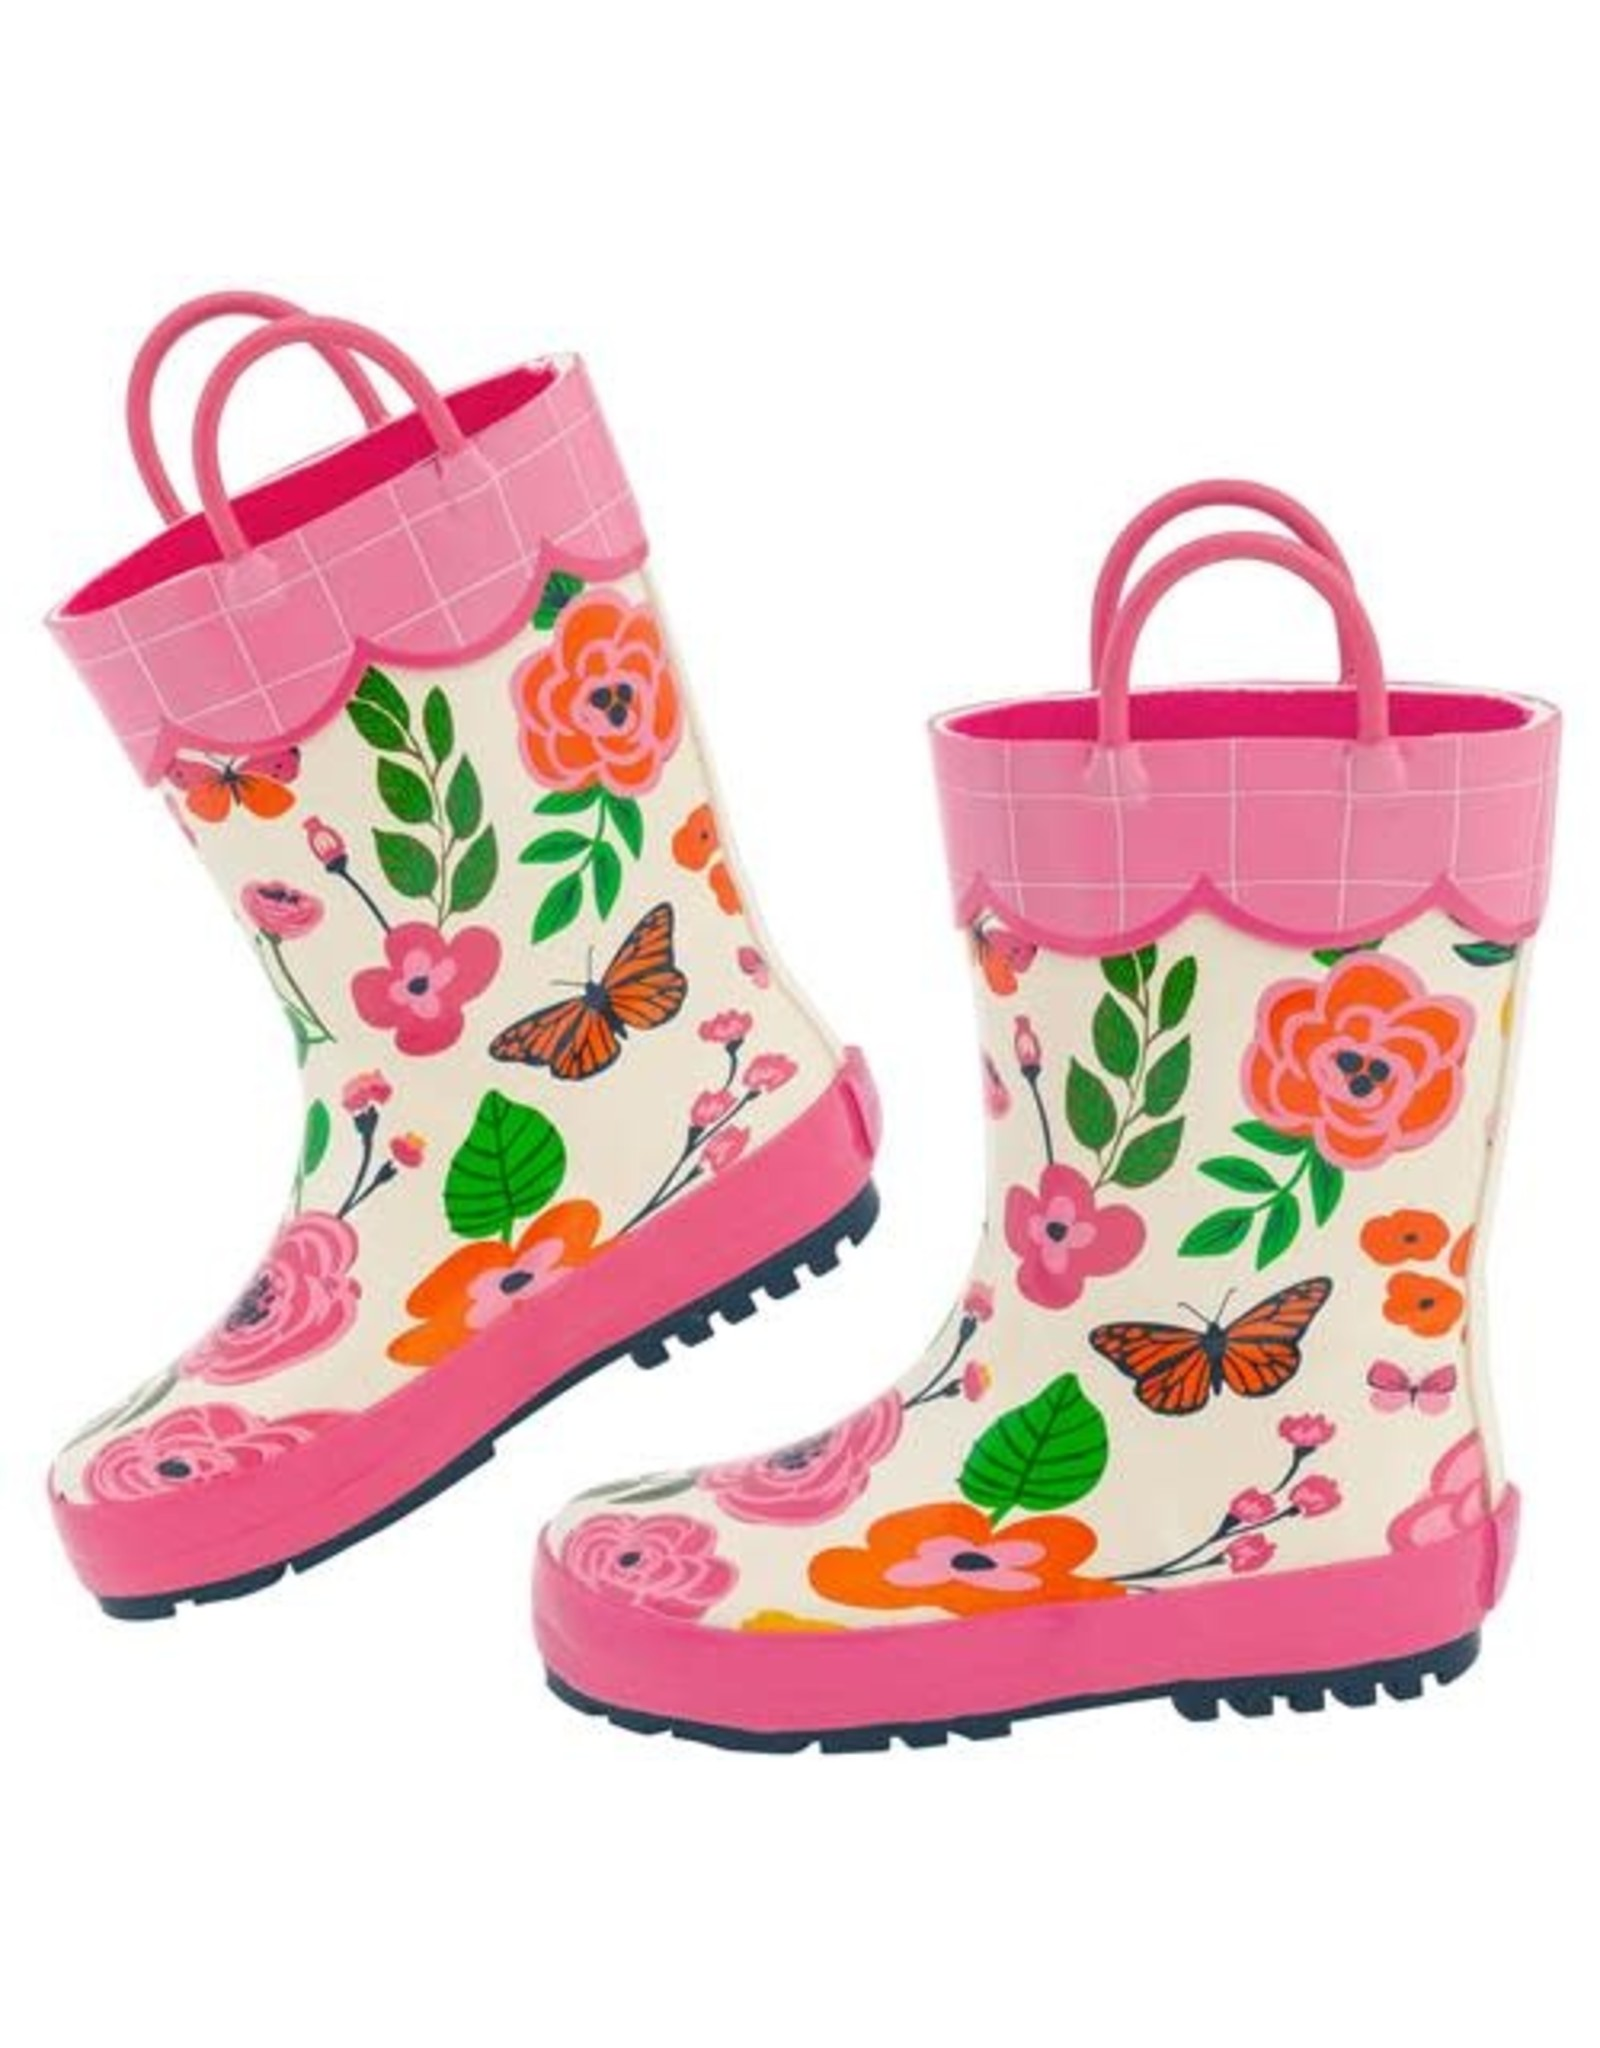 Stephen Joseph Butterfly Rain Boots